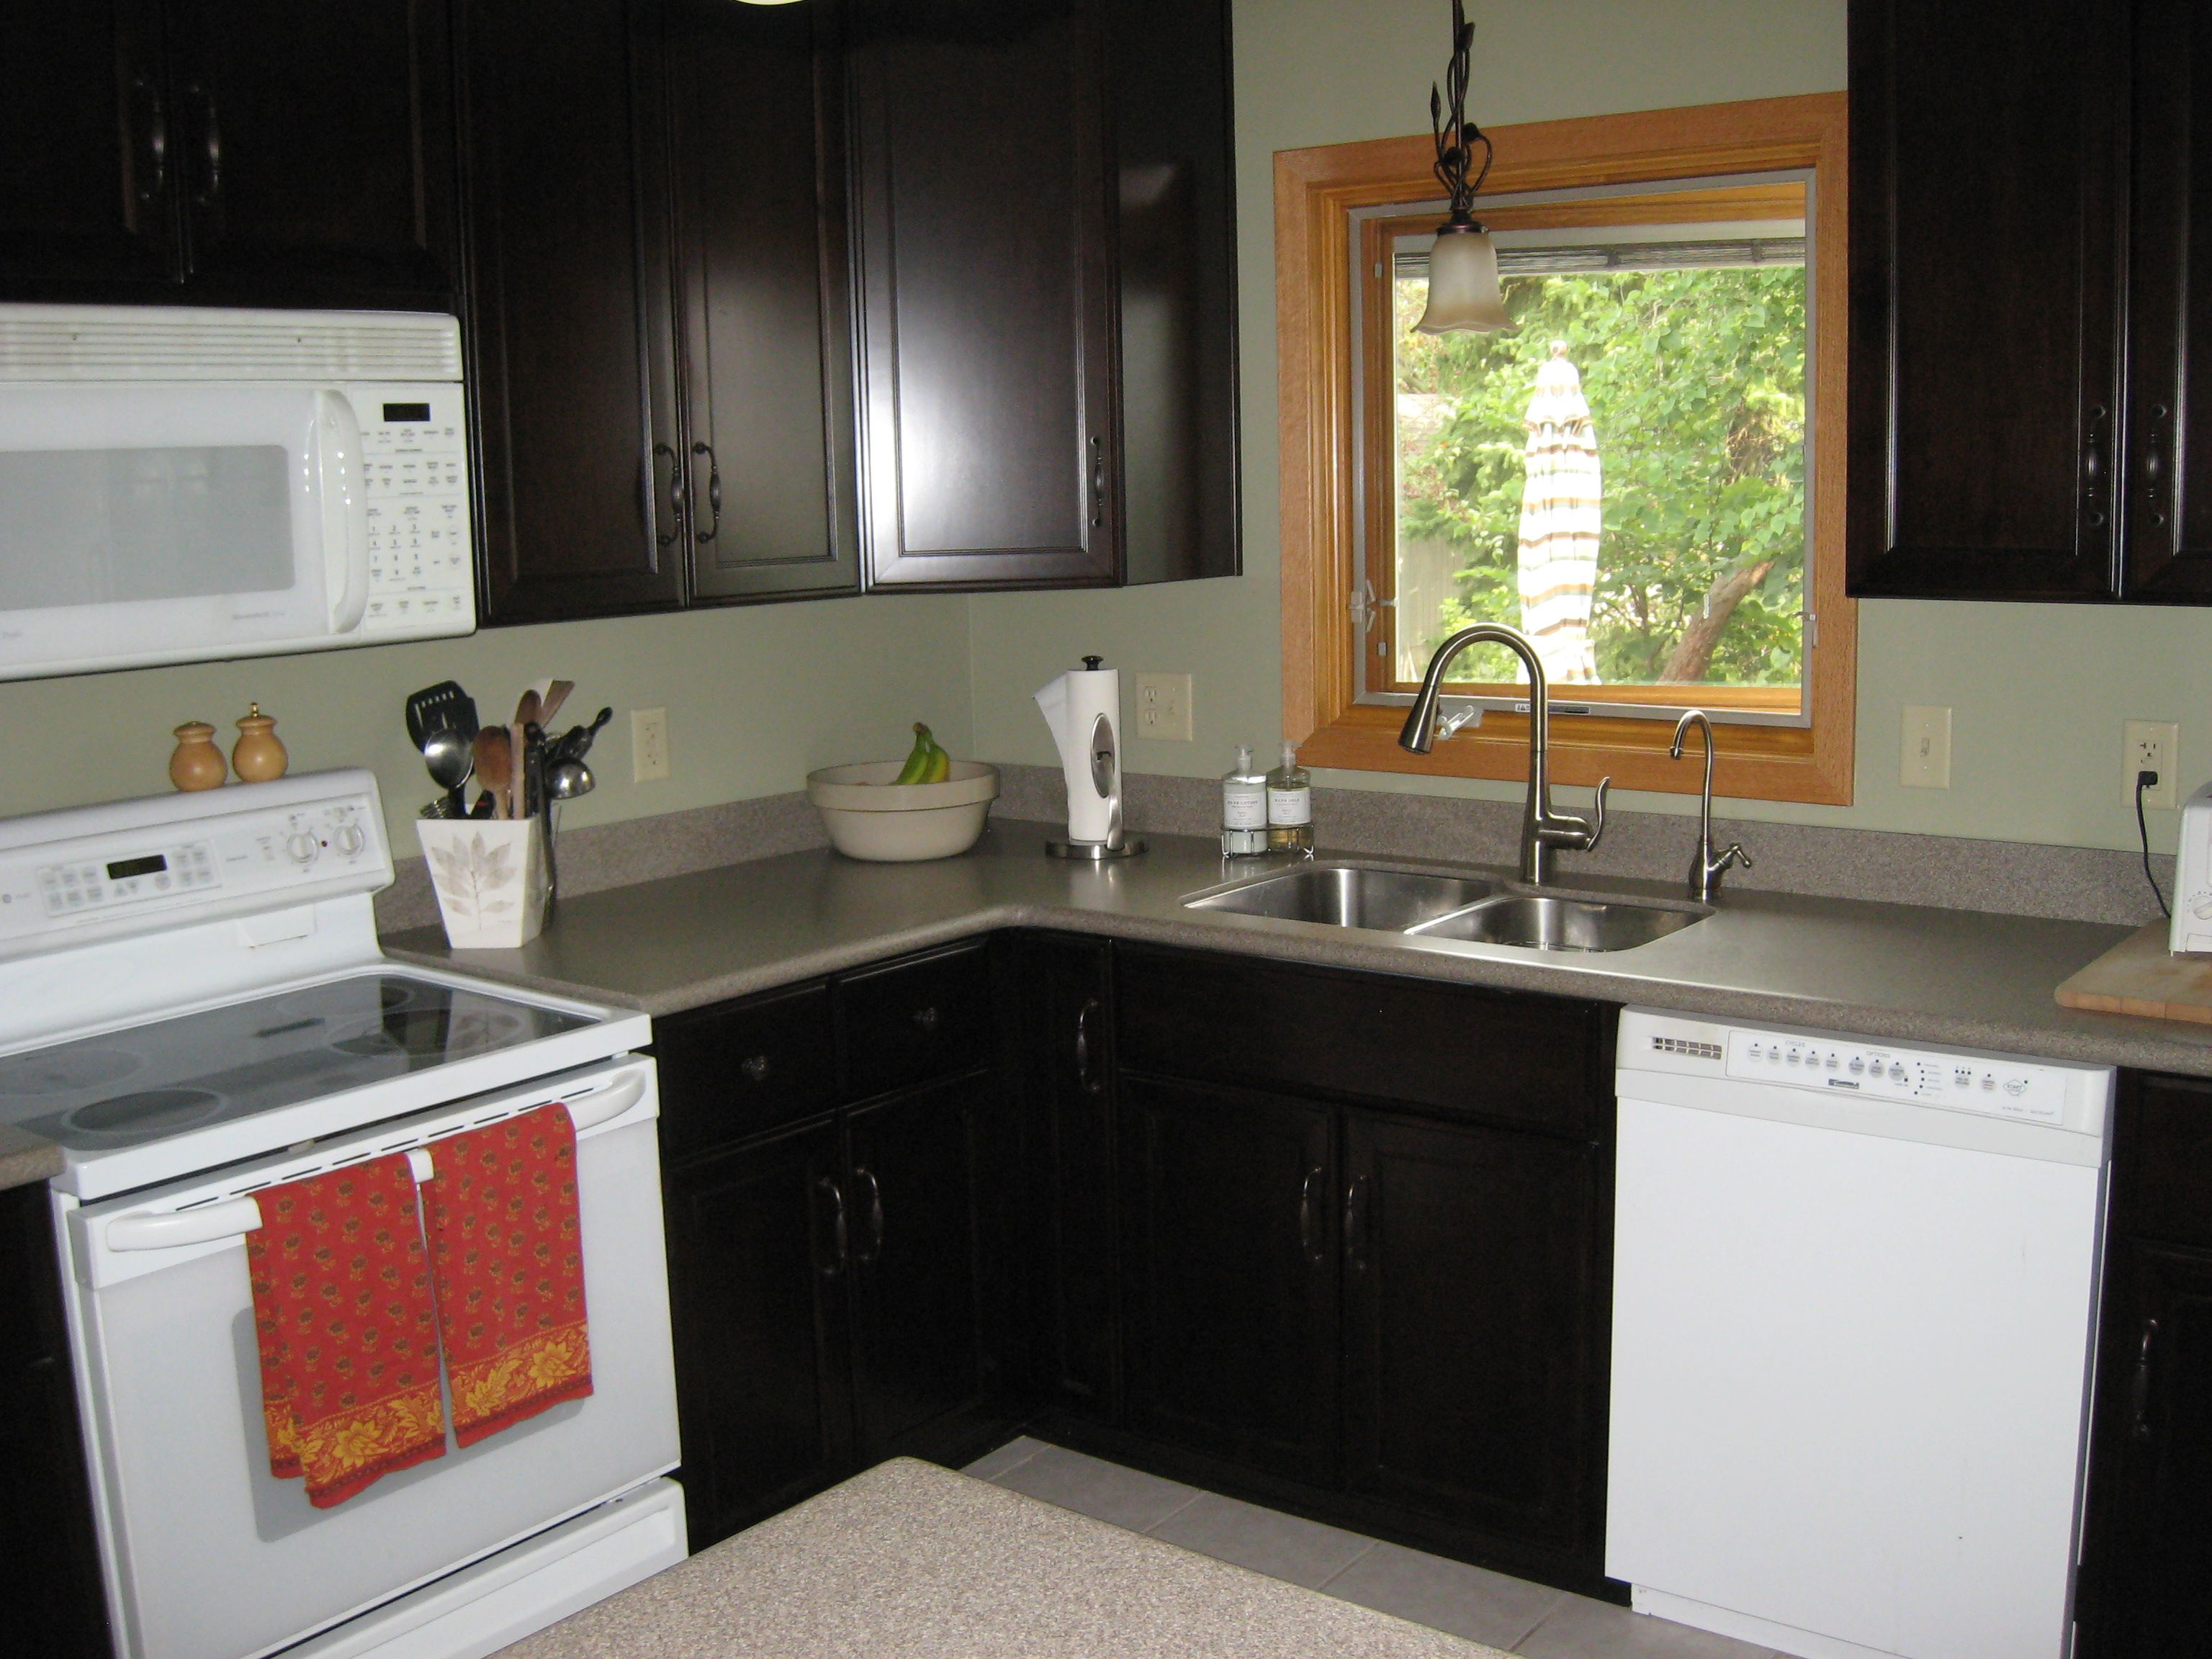 kitchen interiors in l shape kitchen cabinet layout ideas